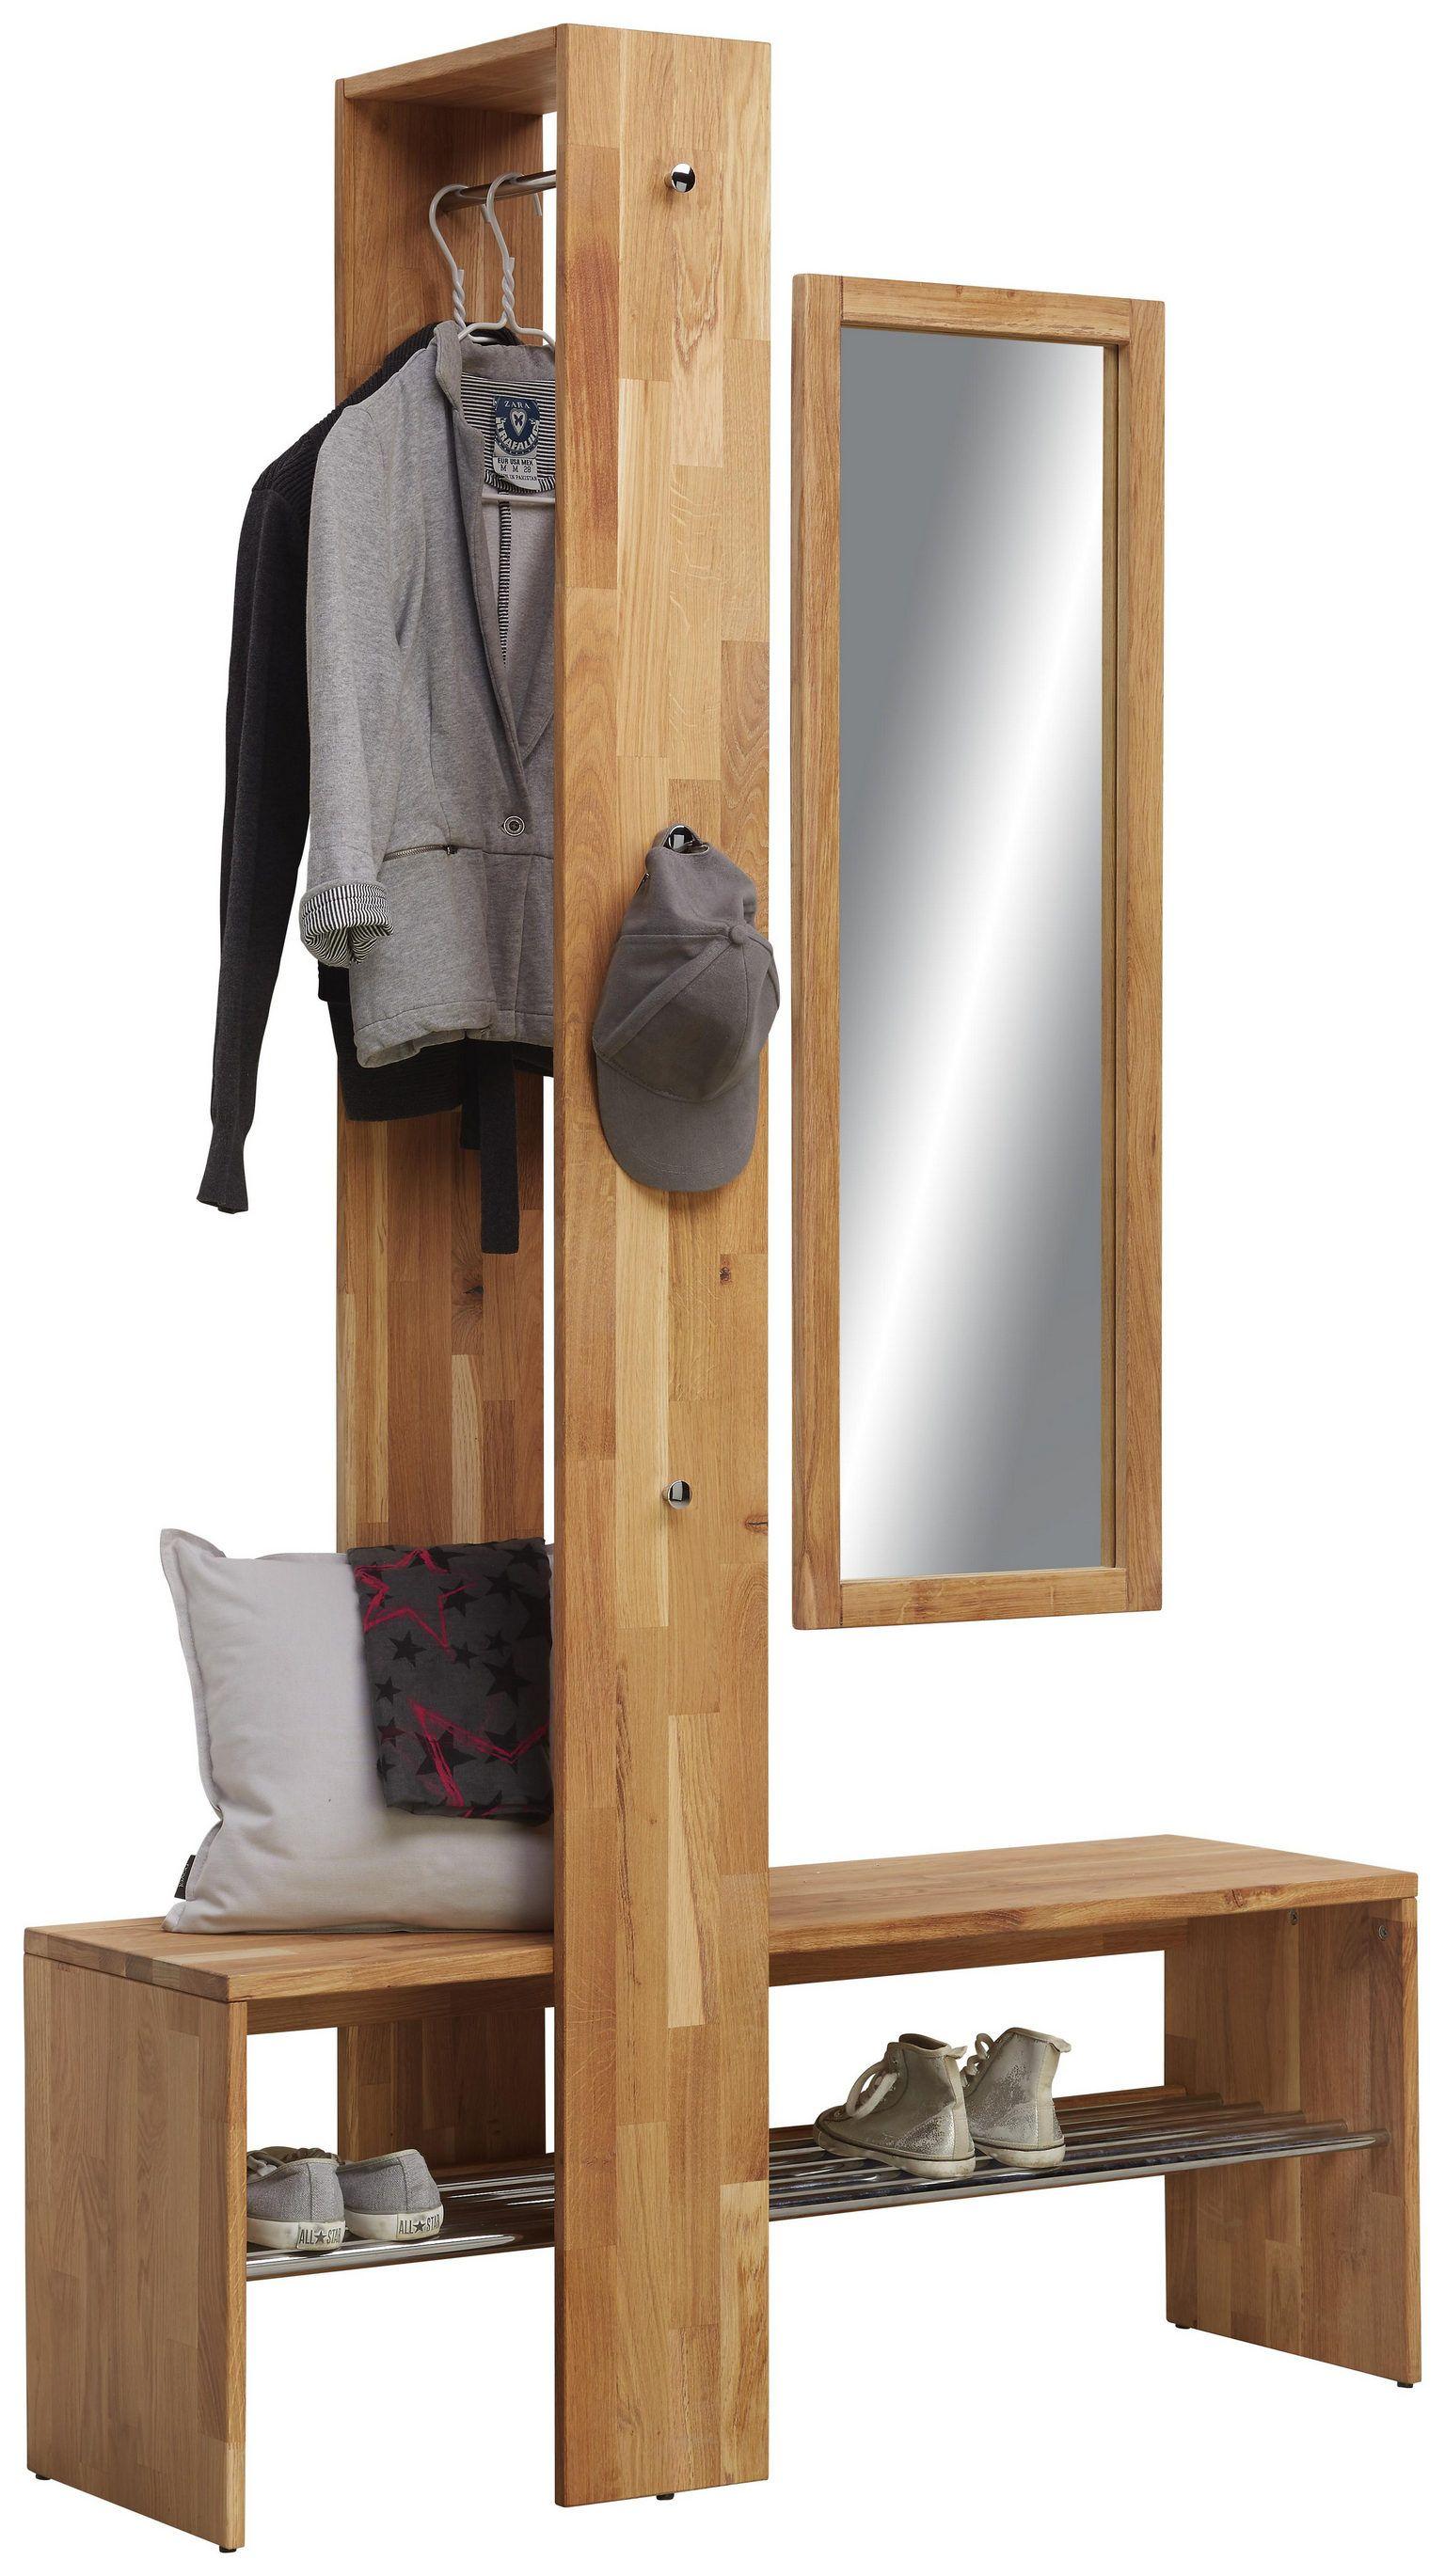 Garderoben-Set 3-tlg. aus Wildeiche massiv shoppen